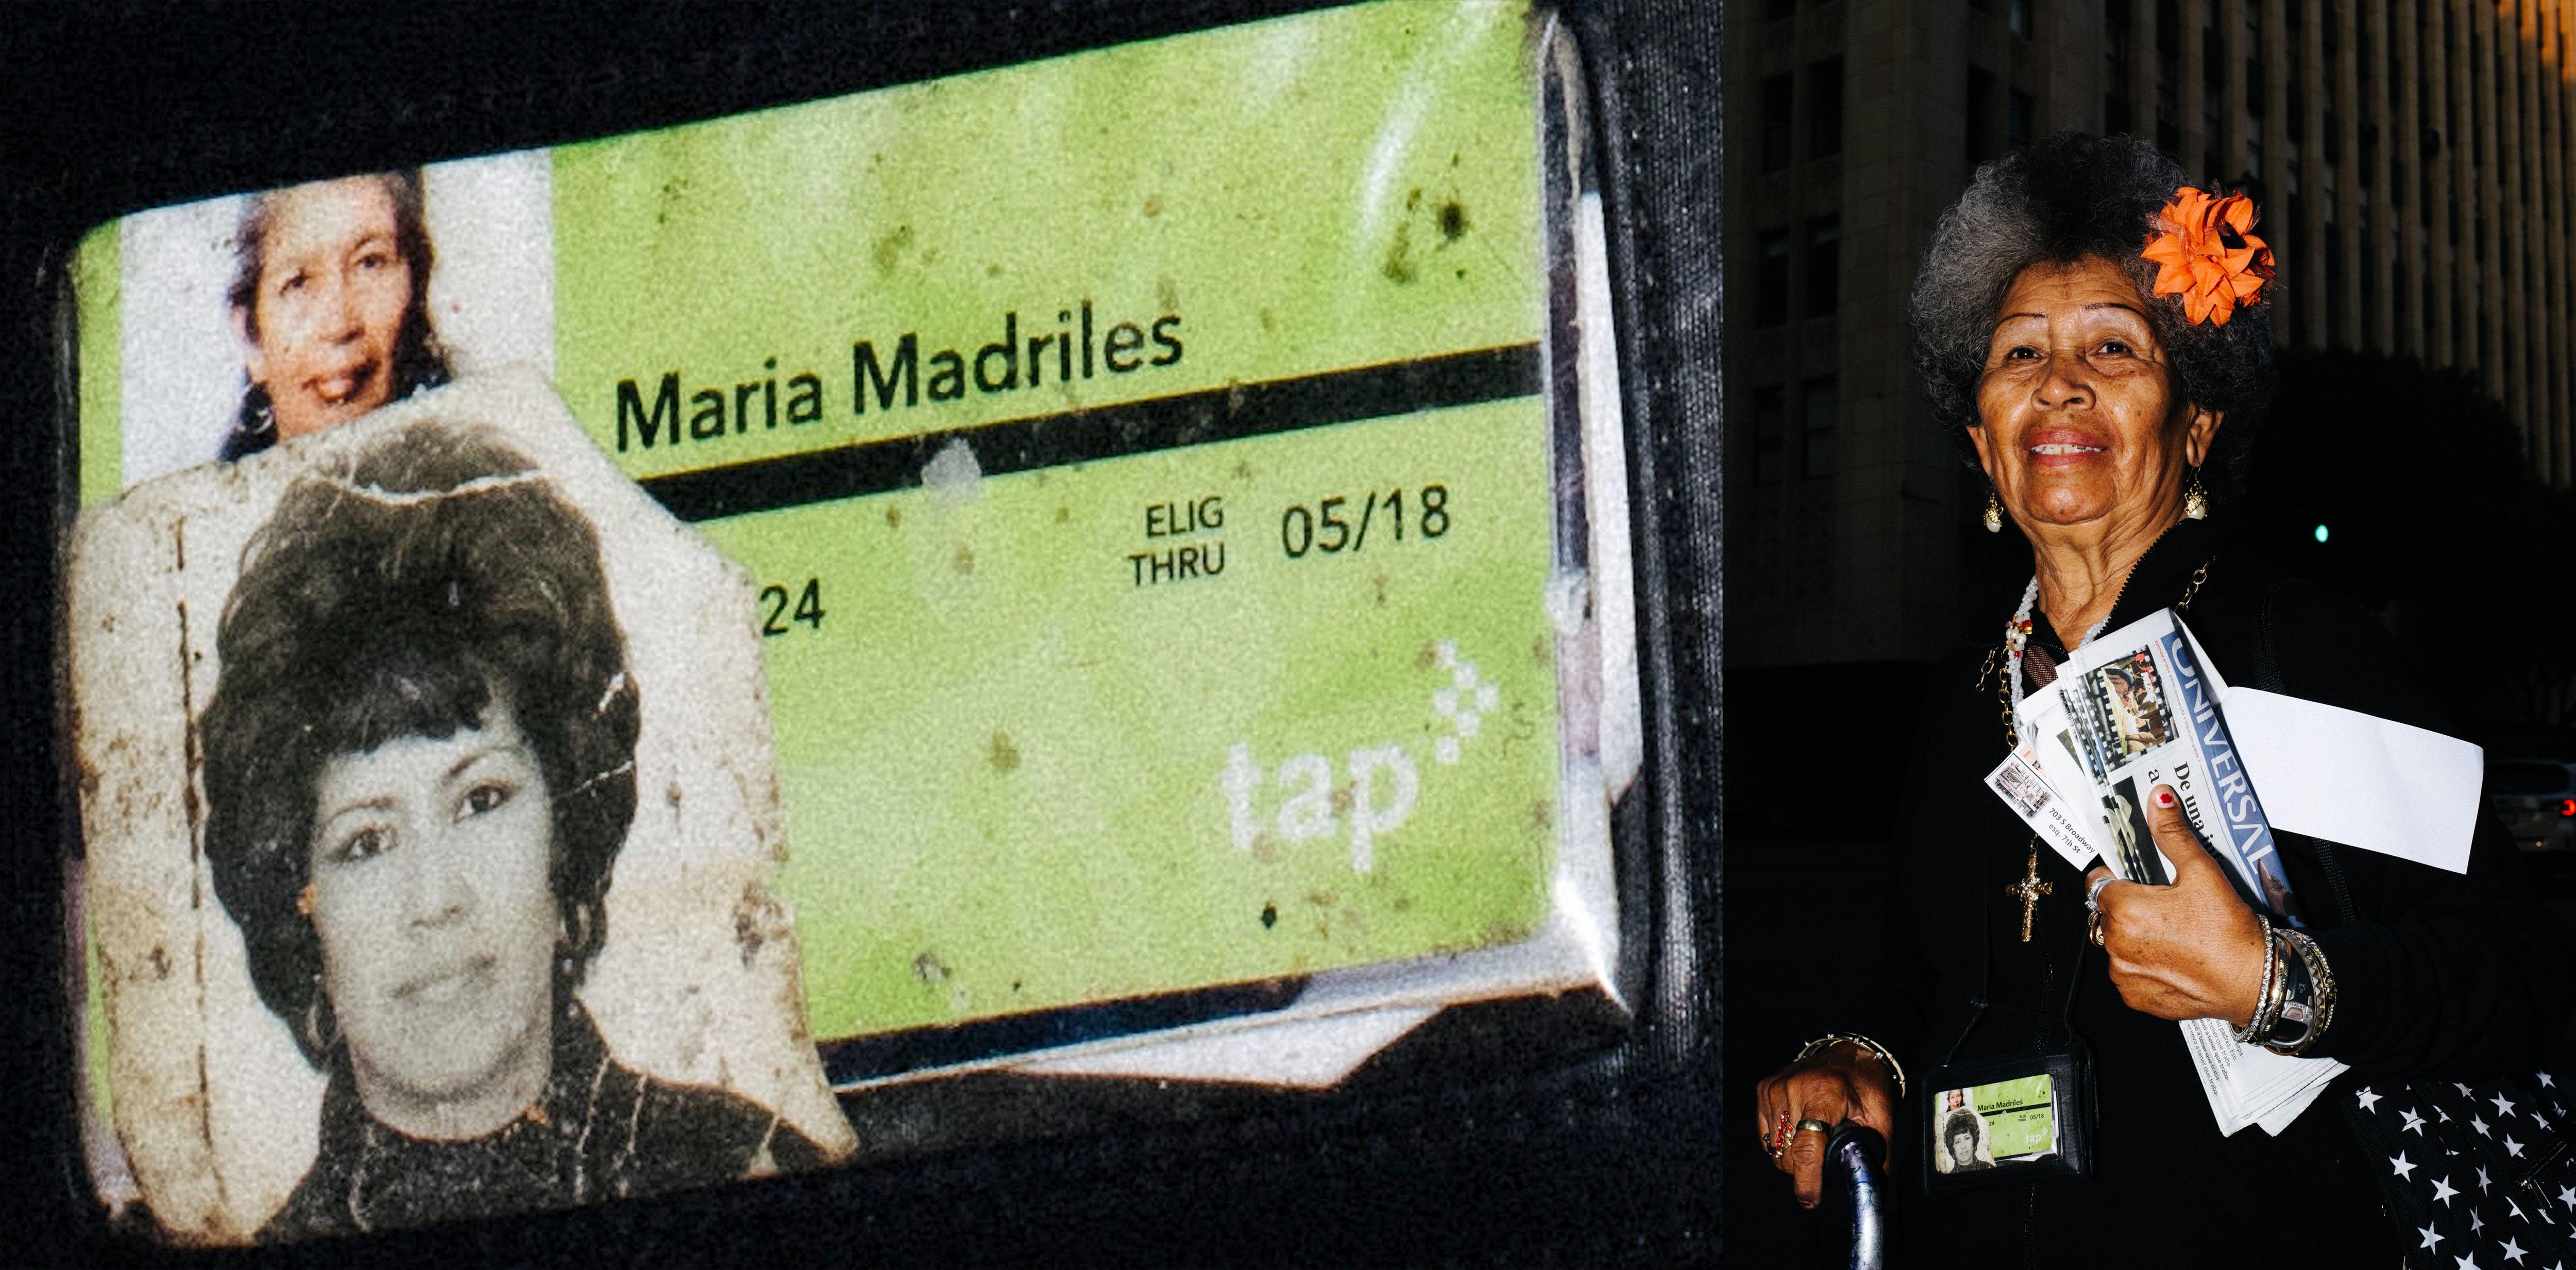 maria madriles-diptych-cover-street-portrait-erickim